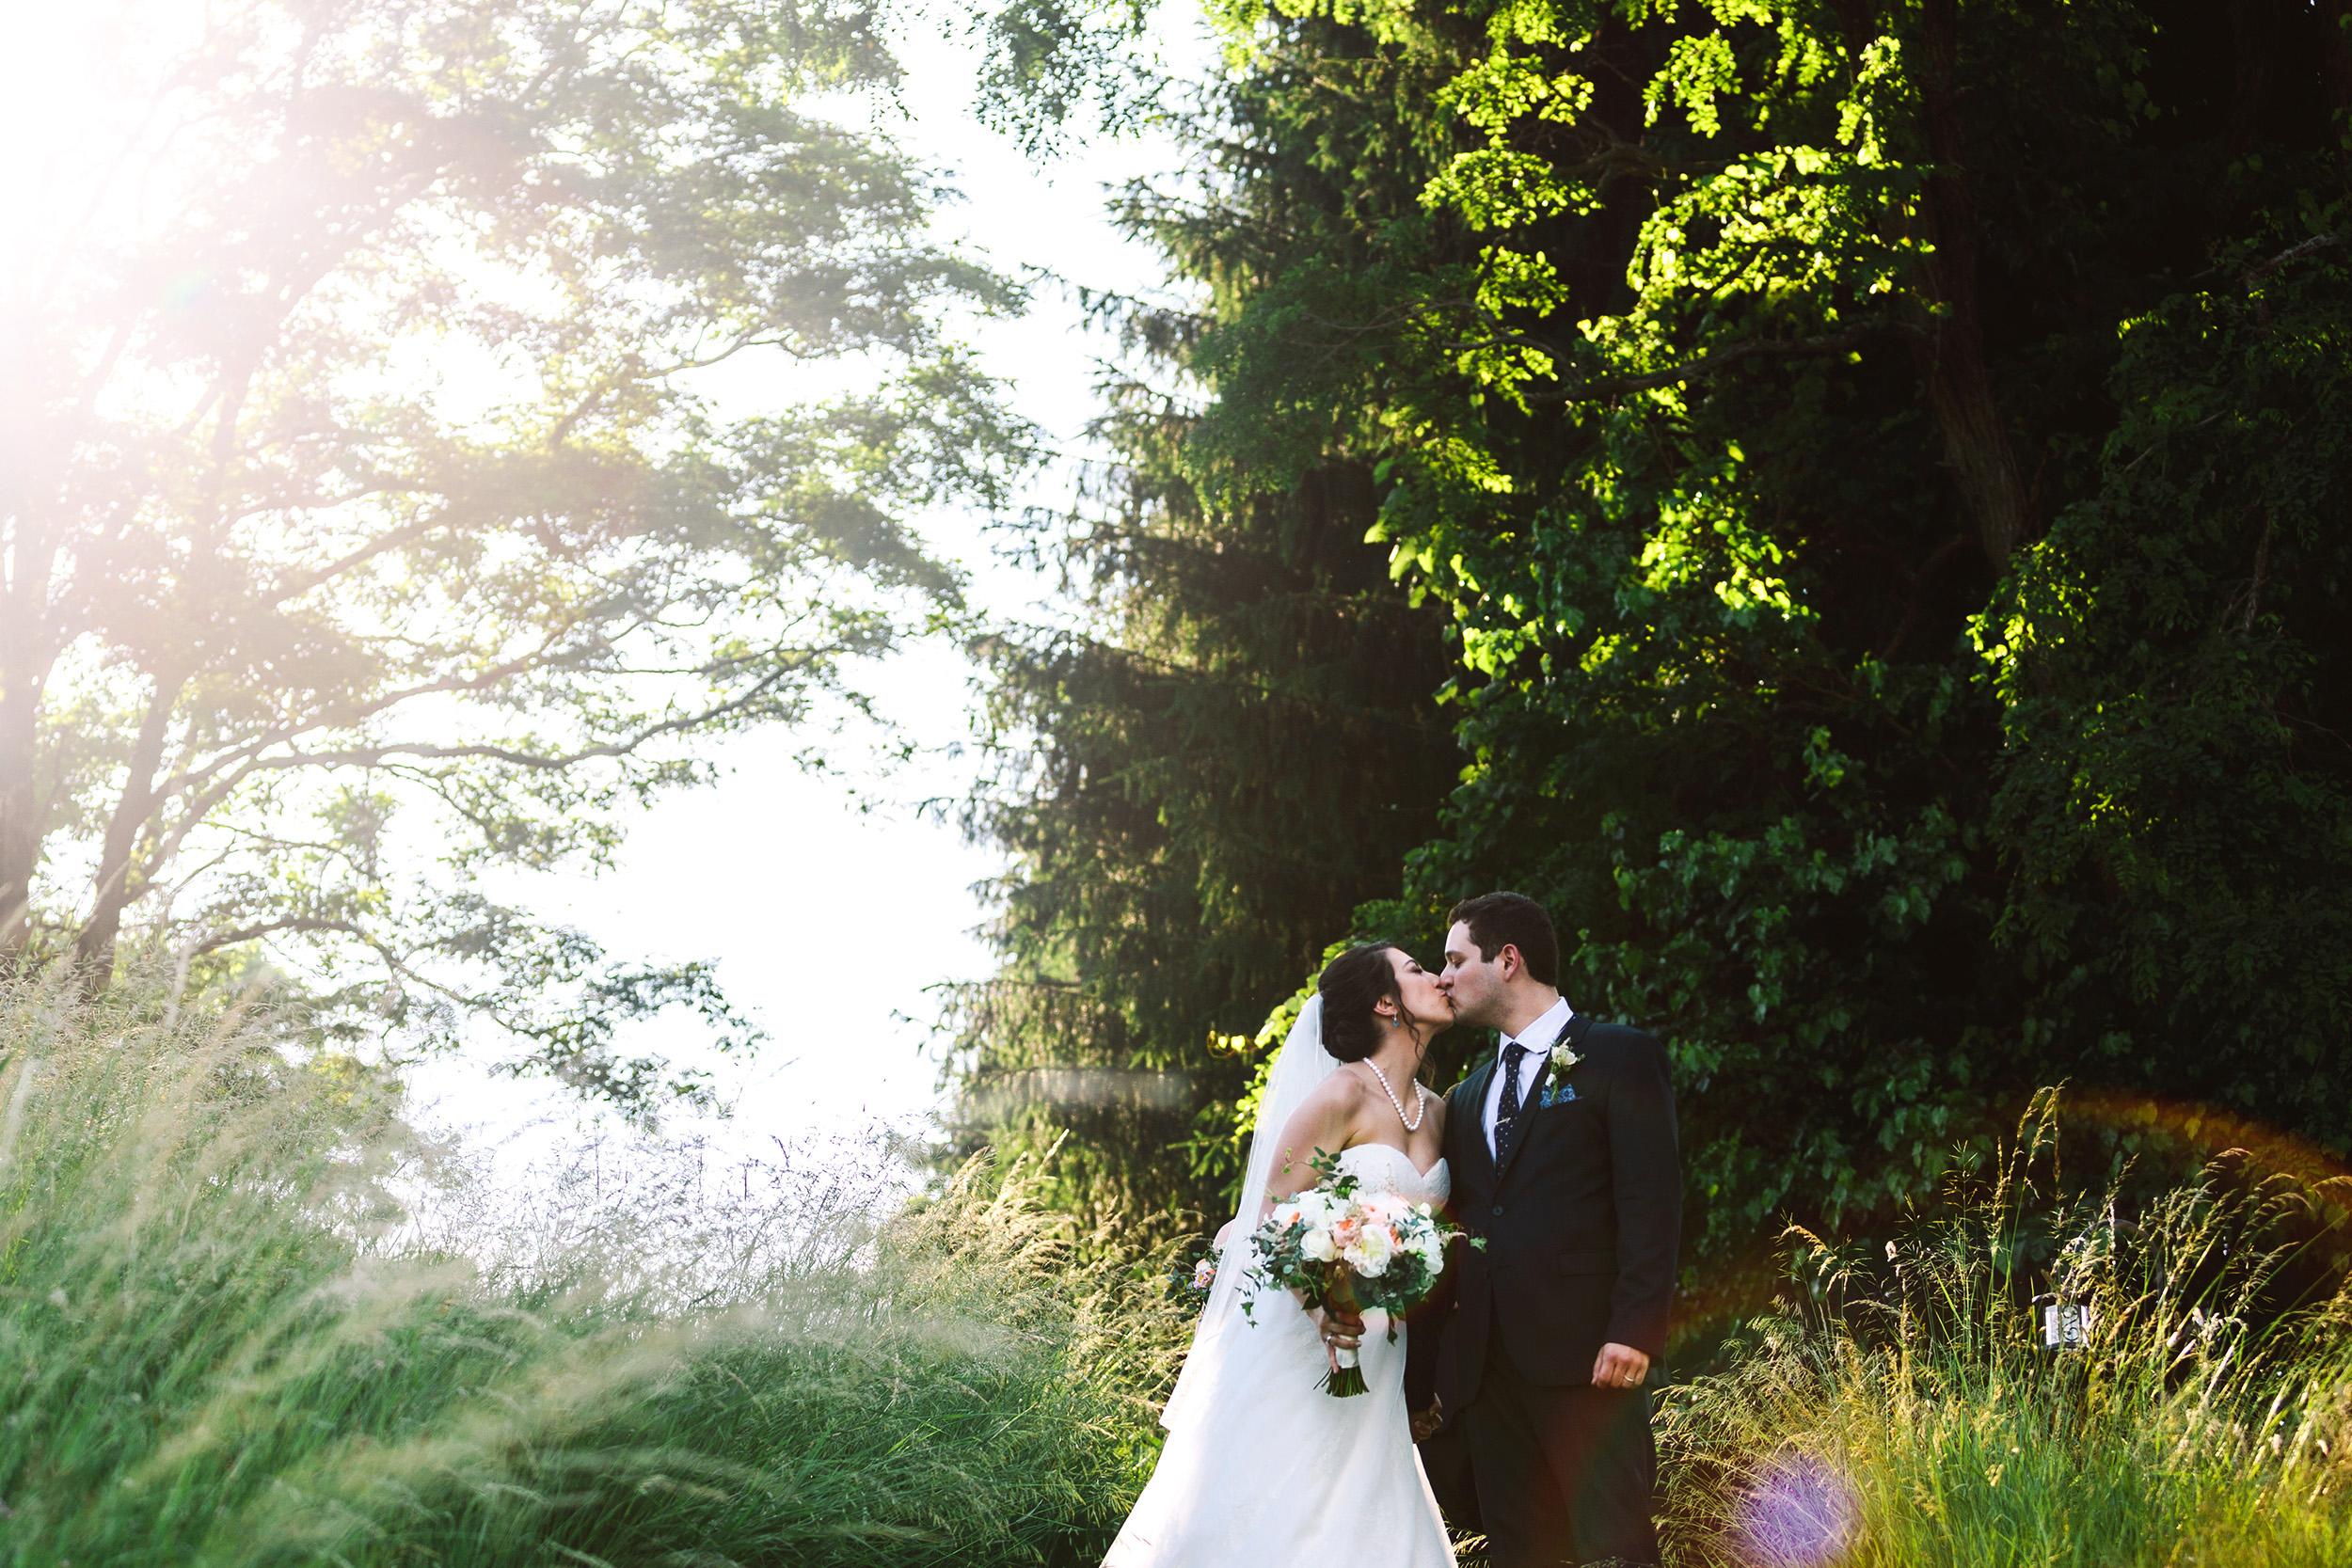 KarliCadel-Wedding-RachelJohn-2308.jpg